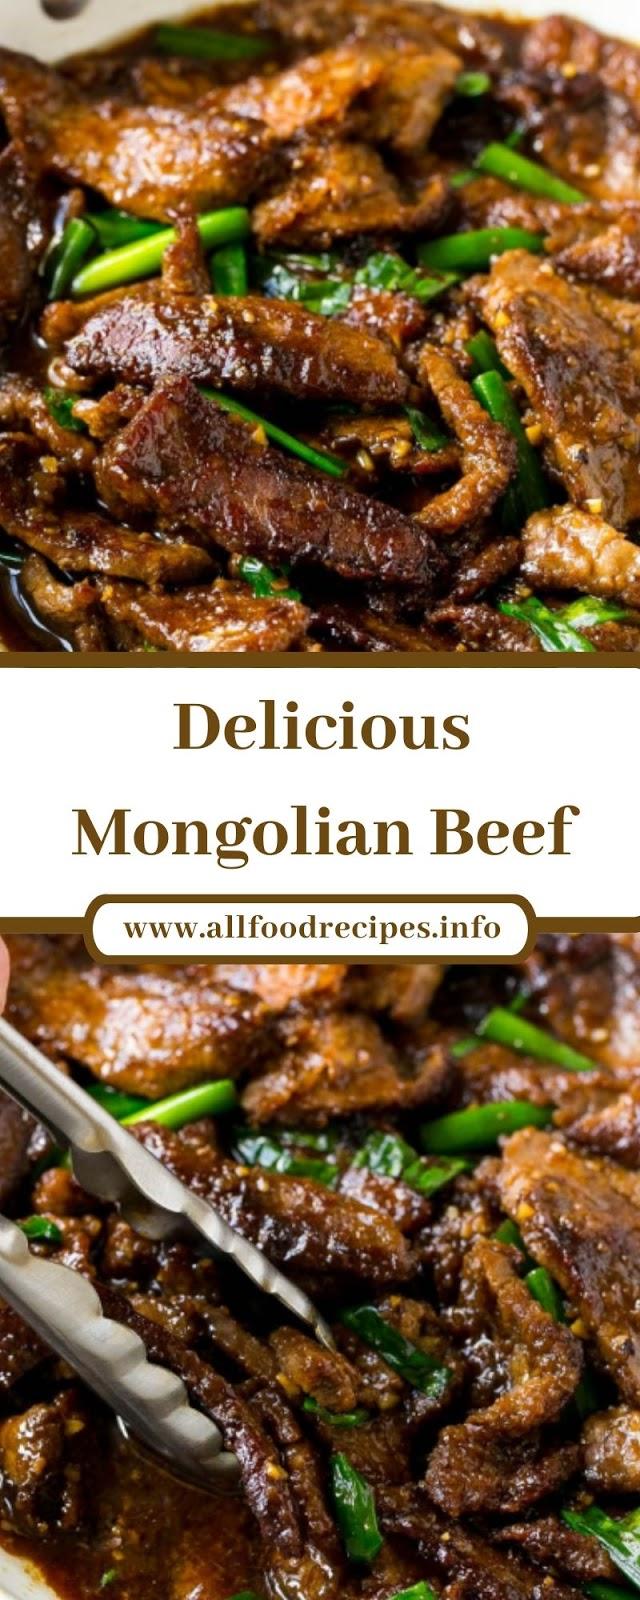 Delicious Mongolian Beef